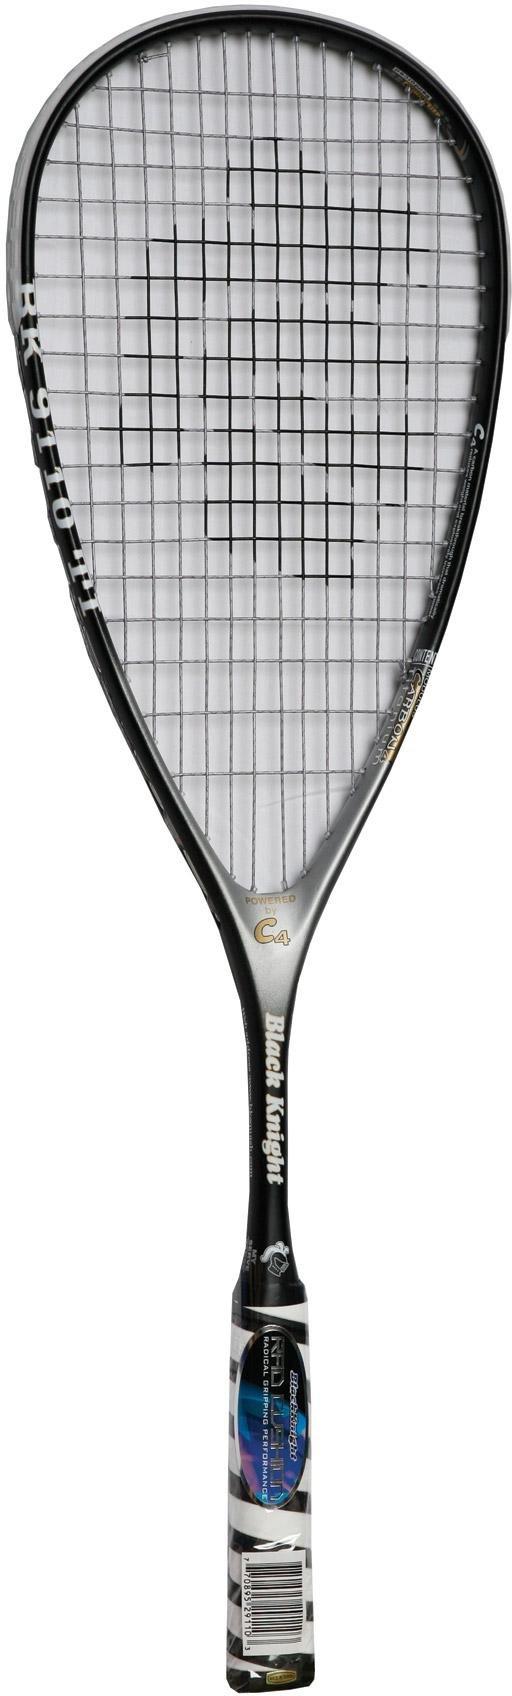 Black Knight 9110 Ti ProLite Squash Racquet